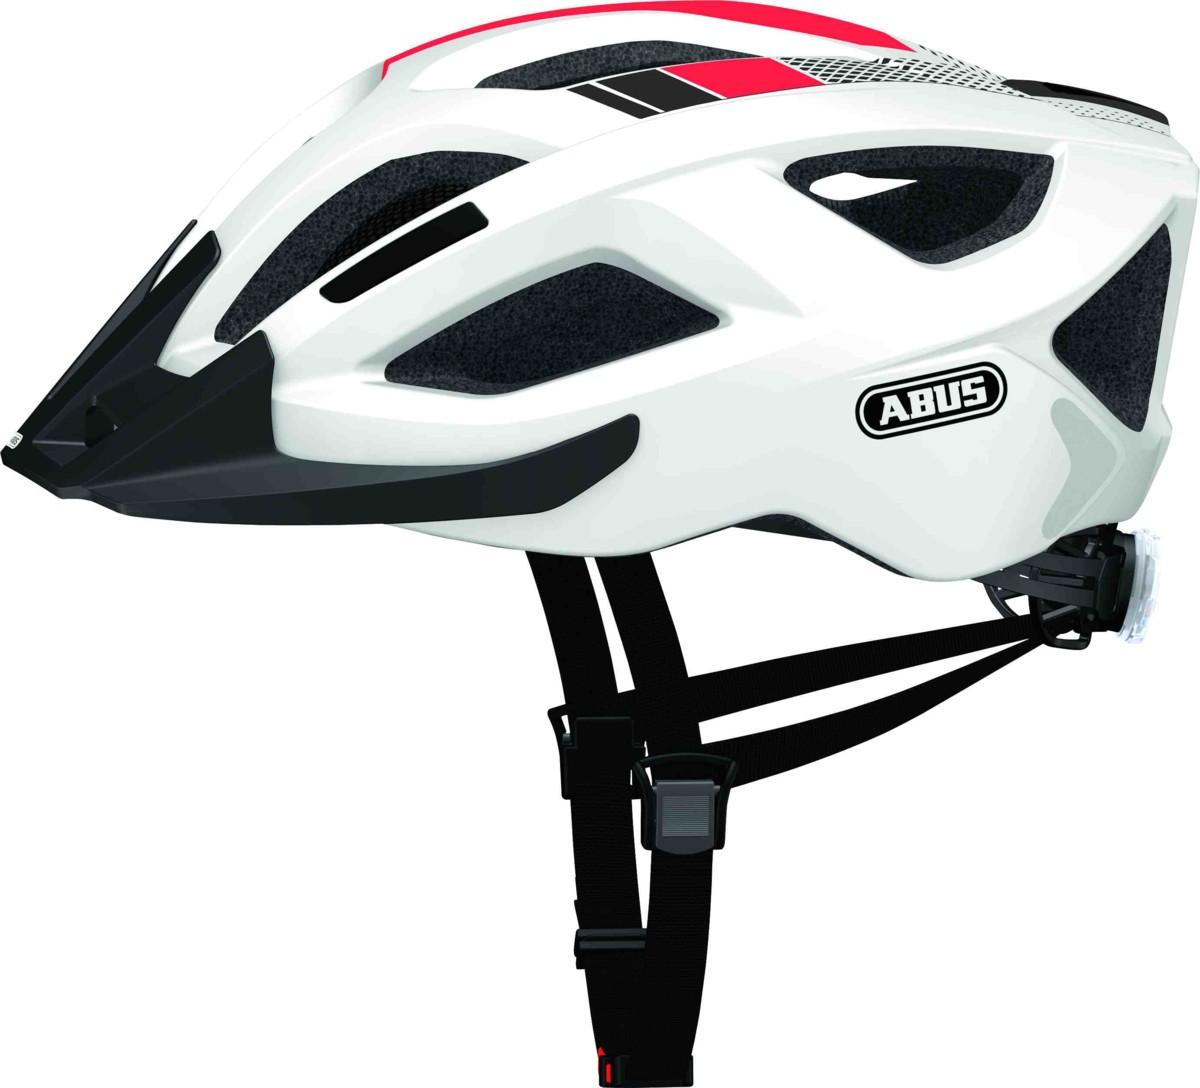 Aduro 2.0 race white - Aduro 2.0 race white L